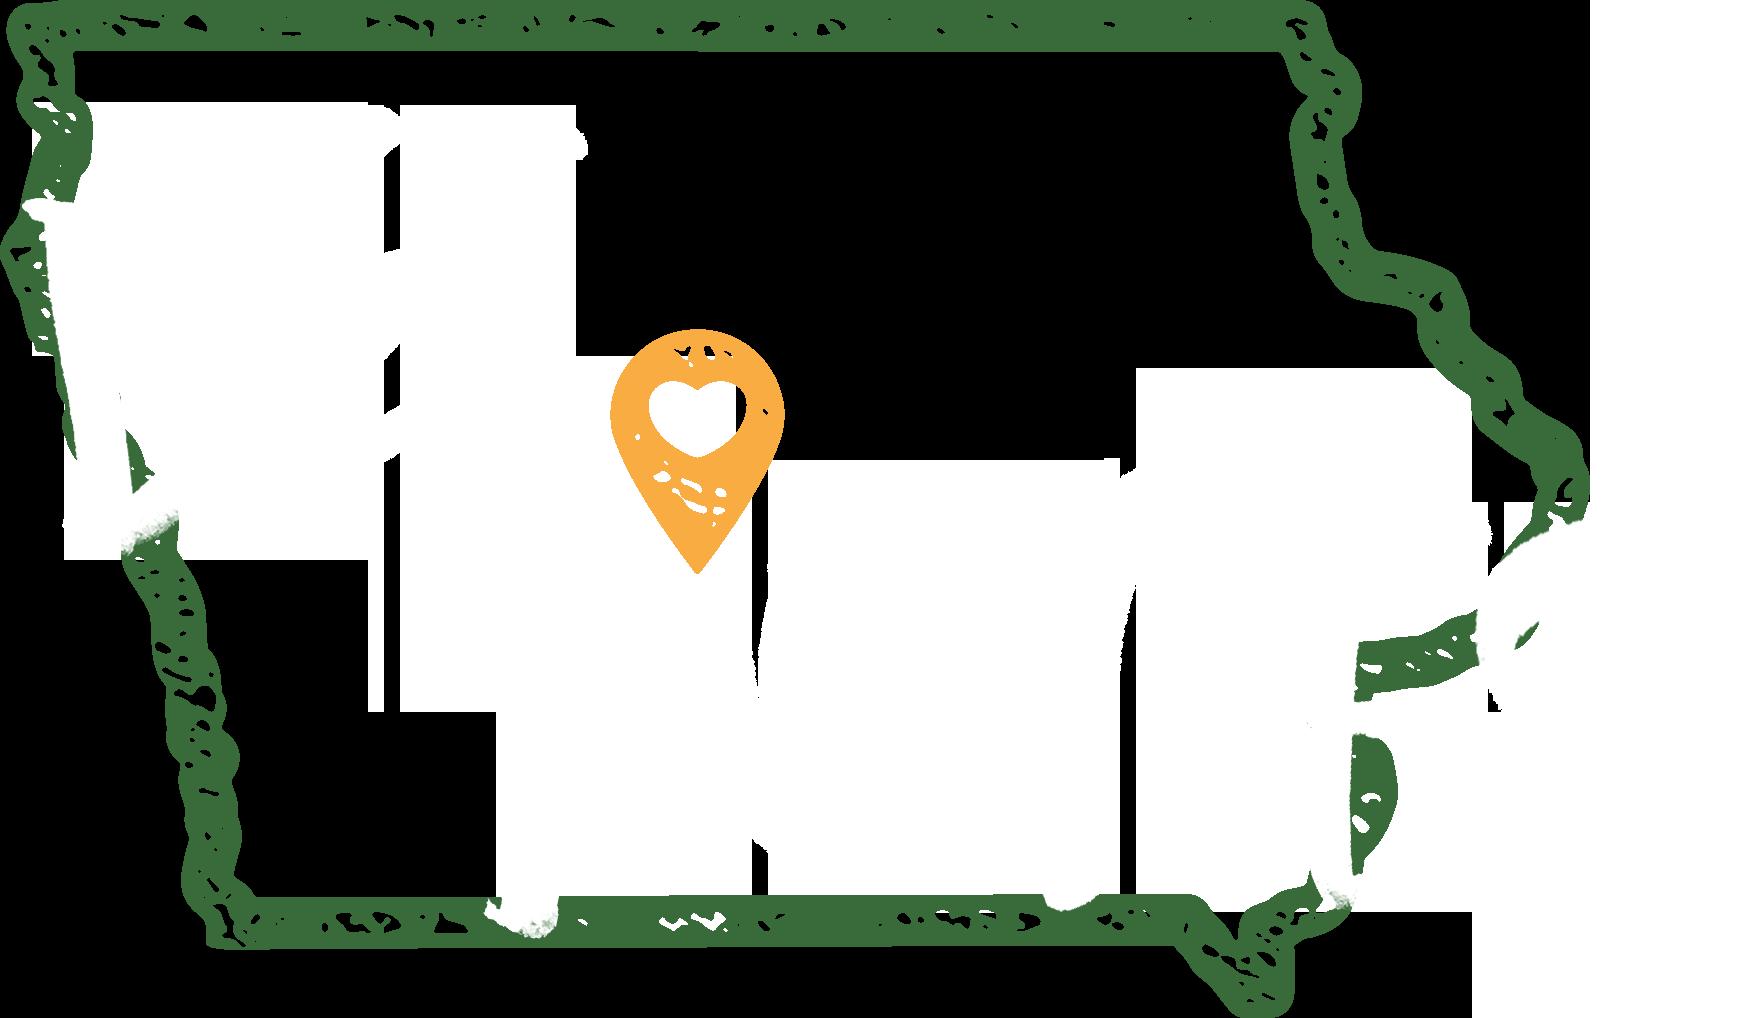 Des moines iowa dating